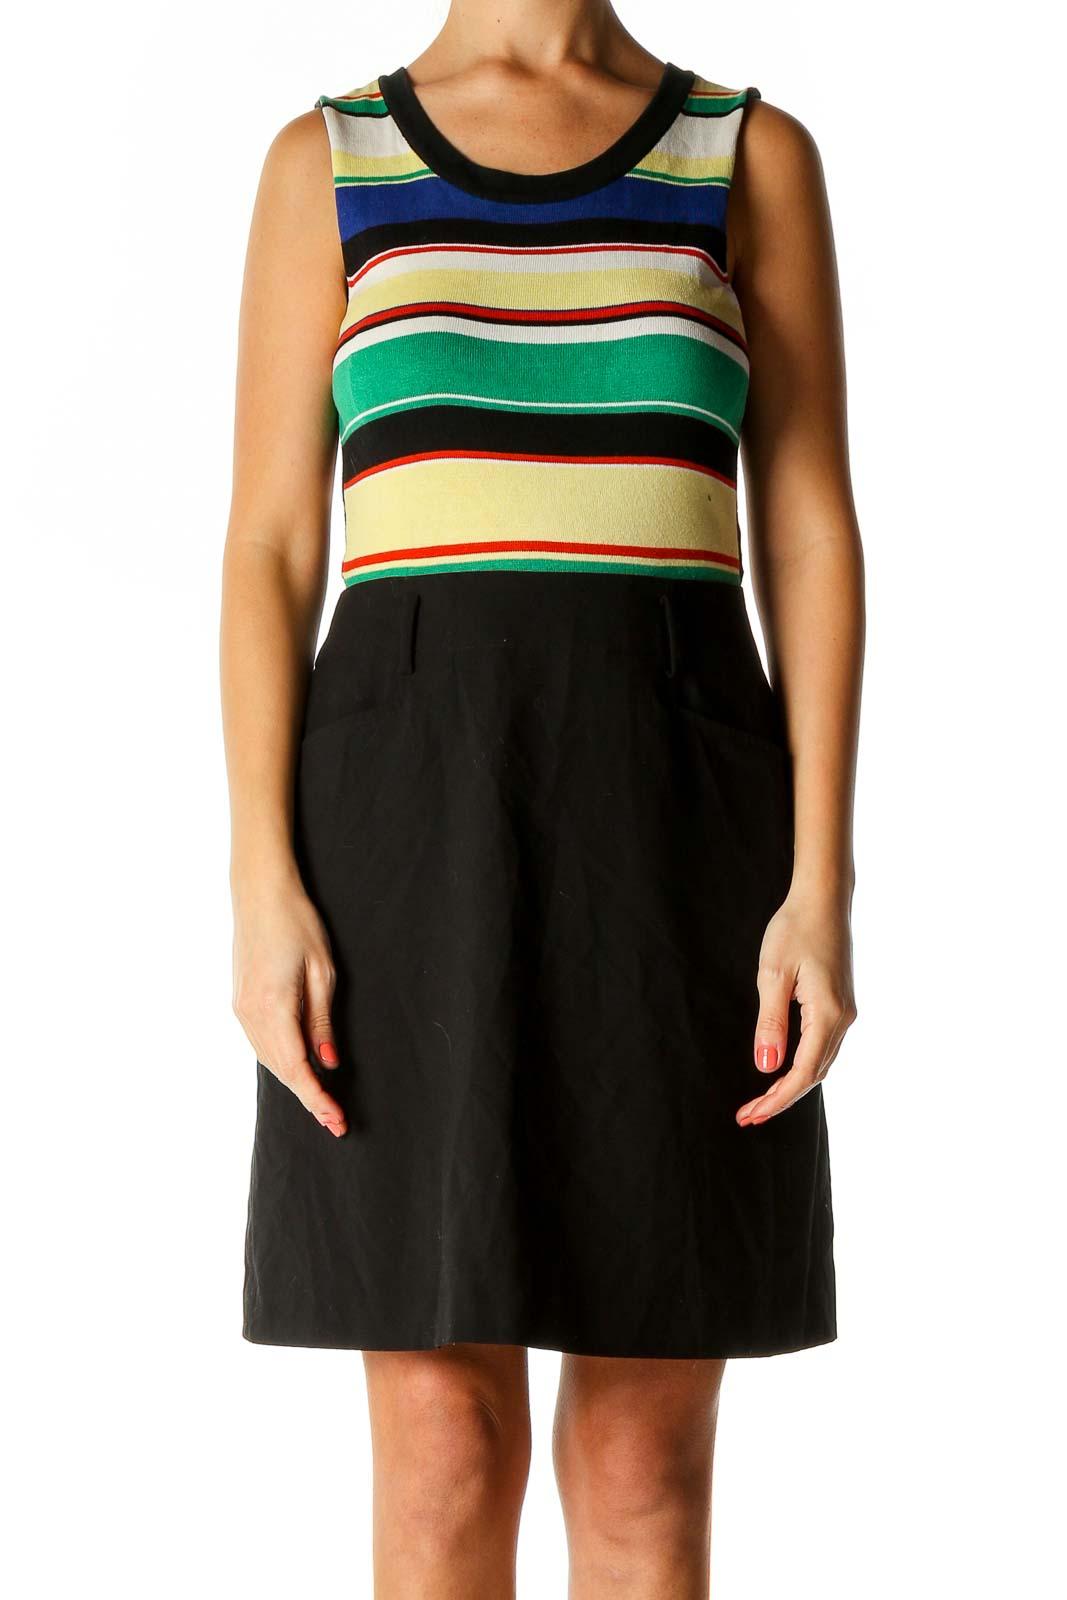 Black Striped Dress Front